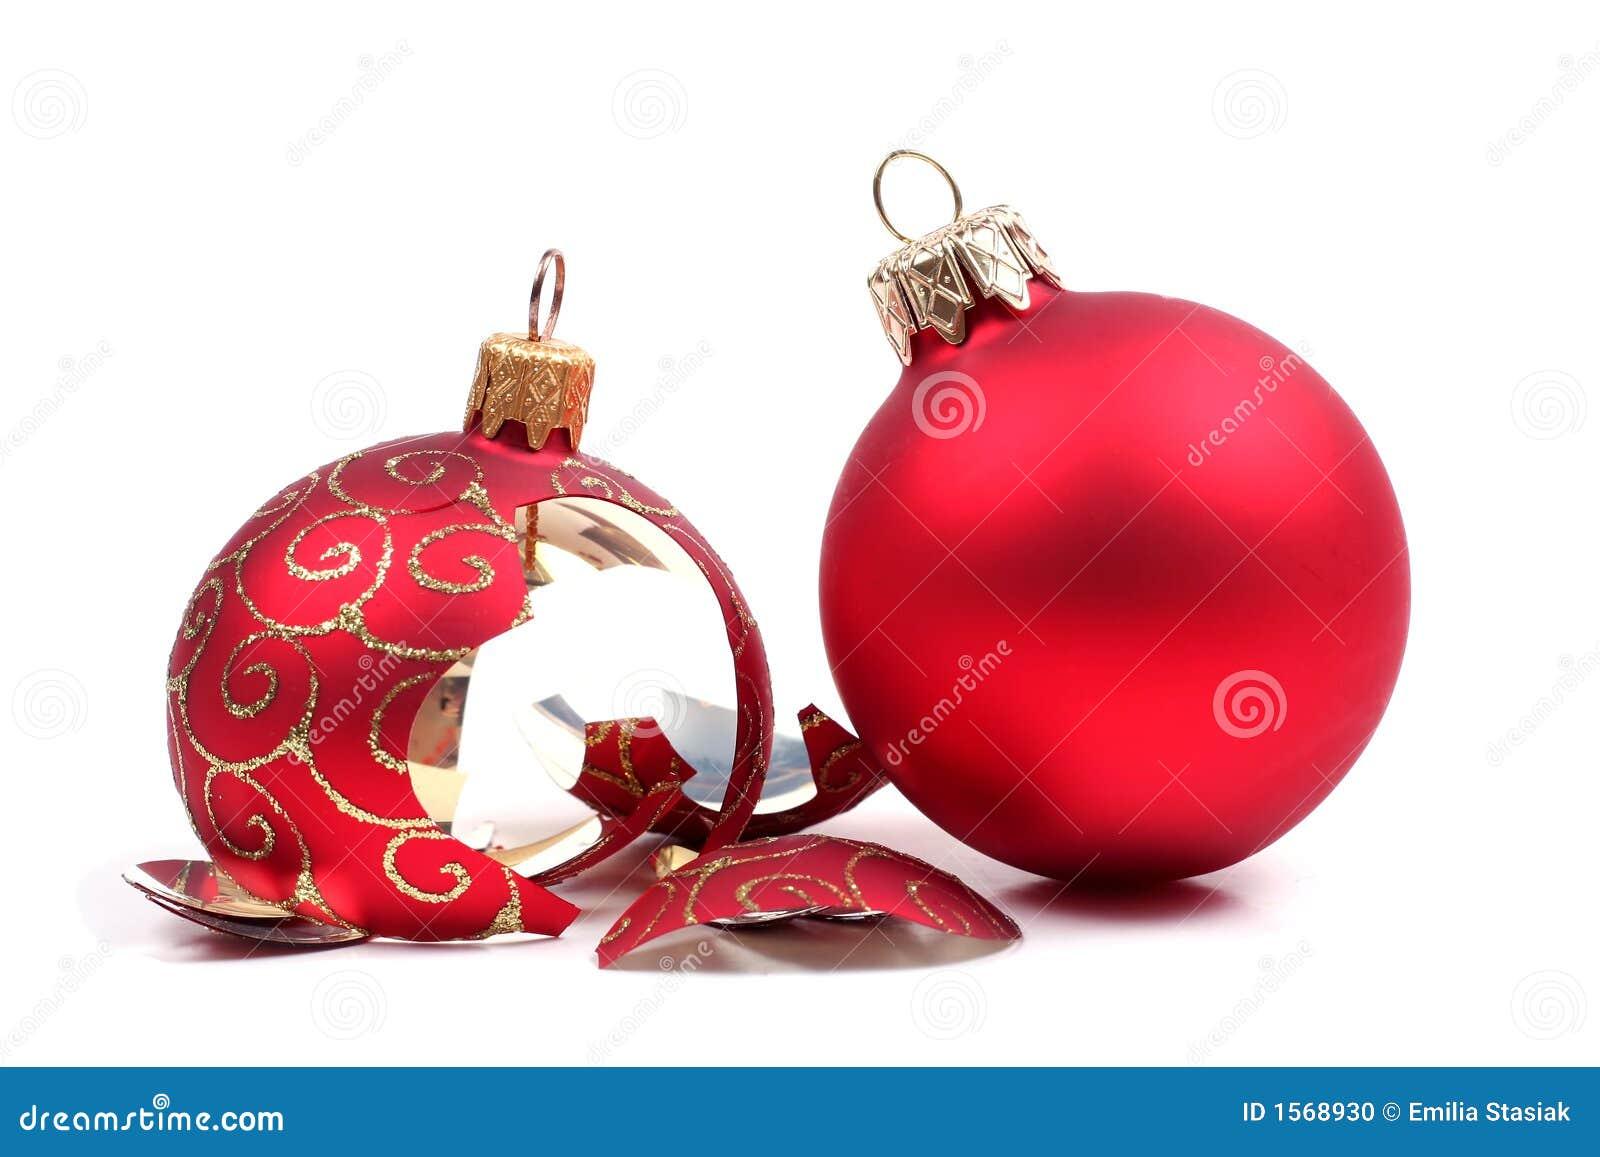 Christmas Carol Ornament